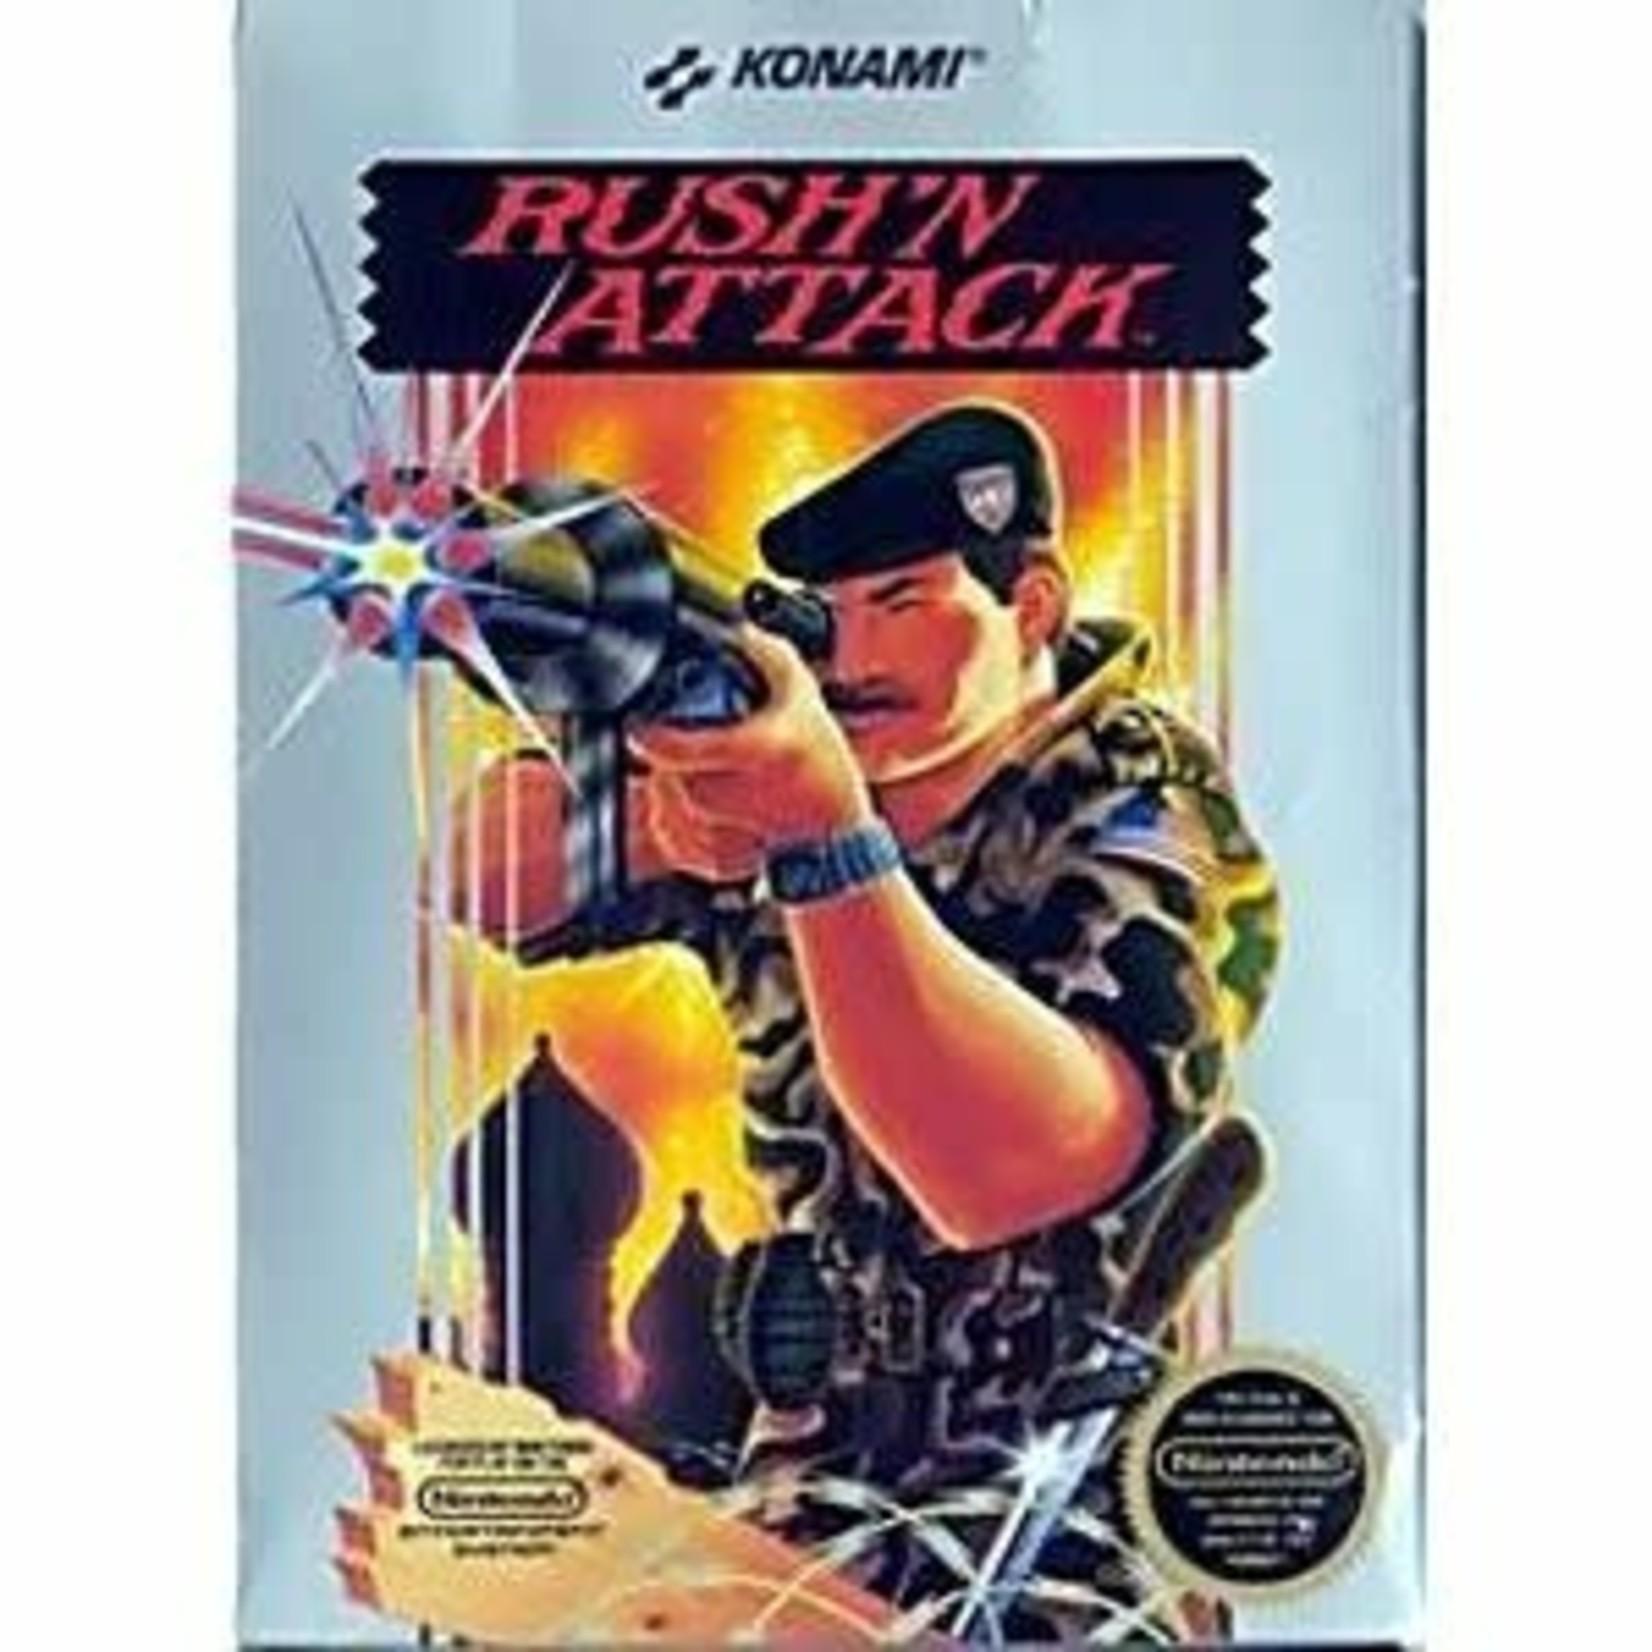 NESu-Rush'N Attack (hardcase)